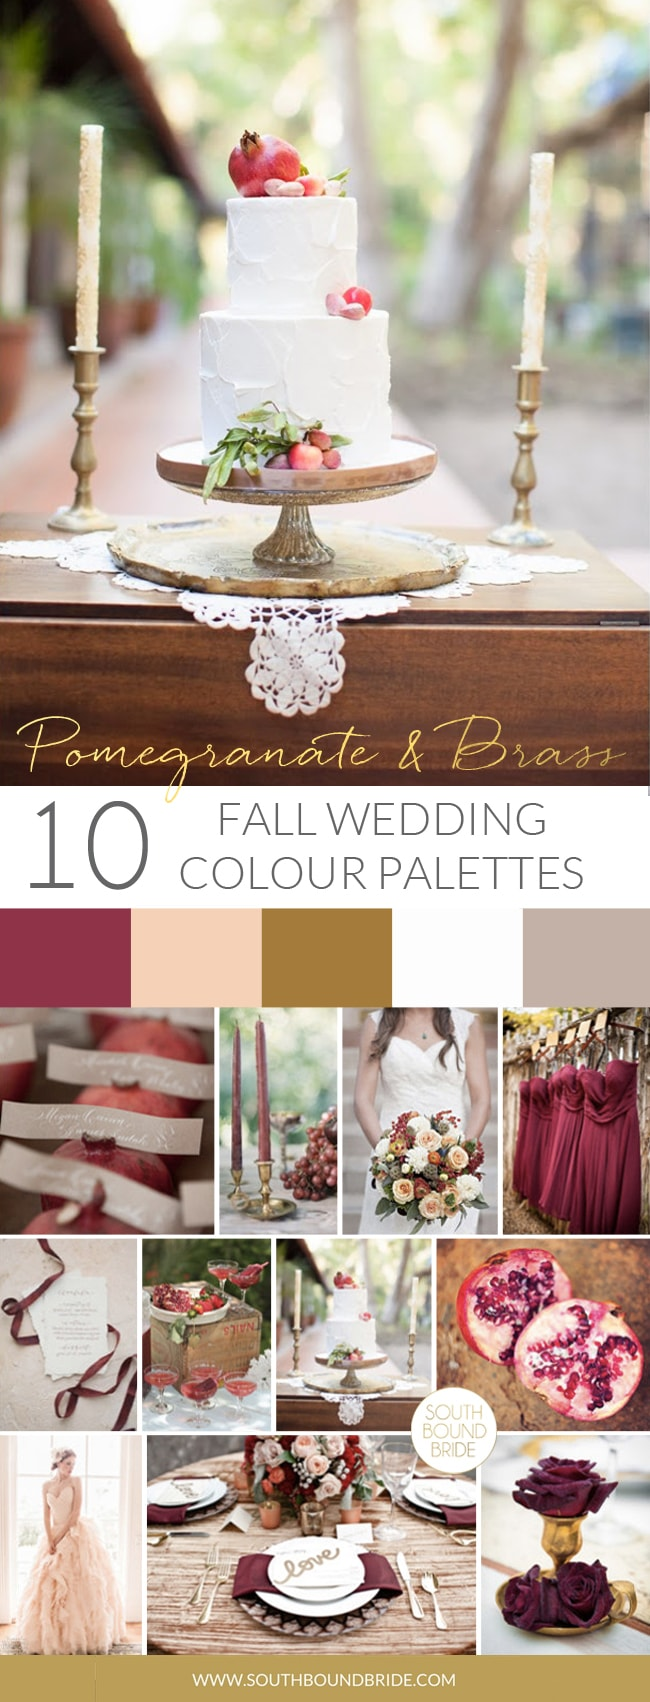 Pomegranate & Brass Fall Wedding Palette | SouthBound Bride